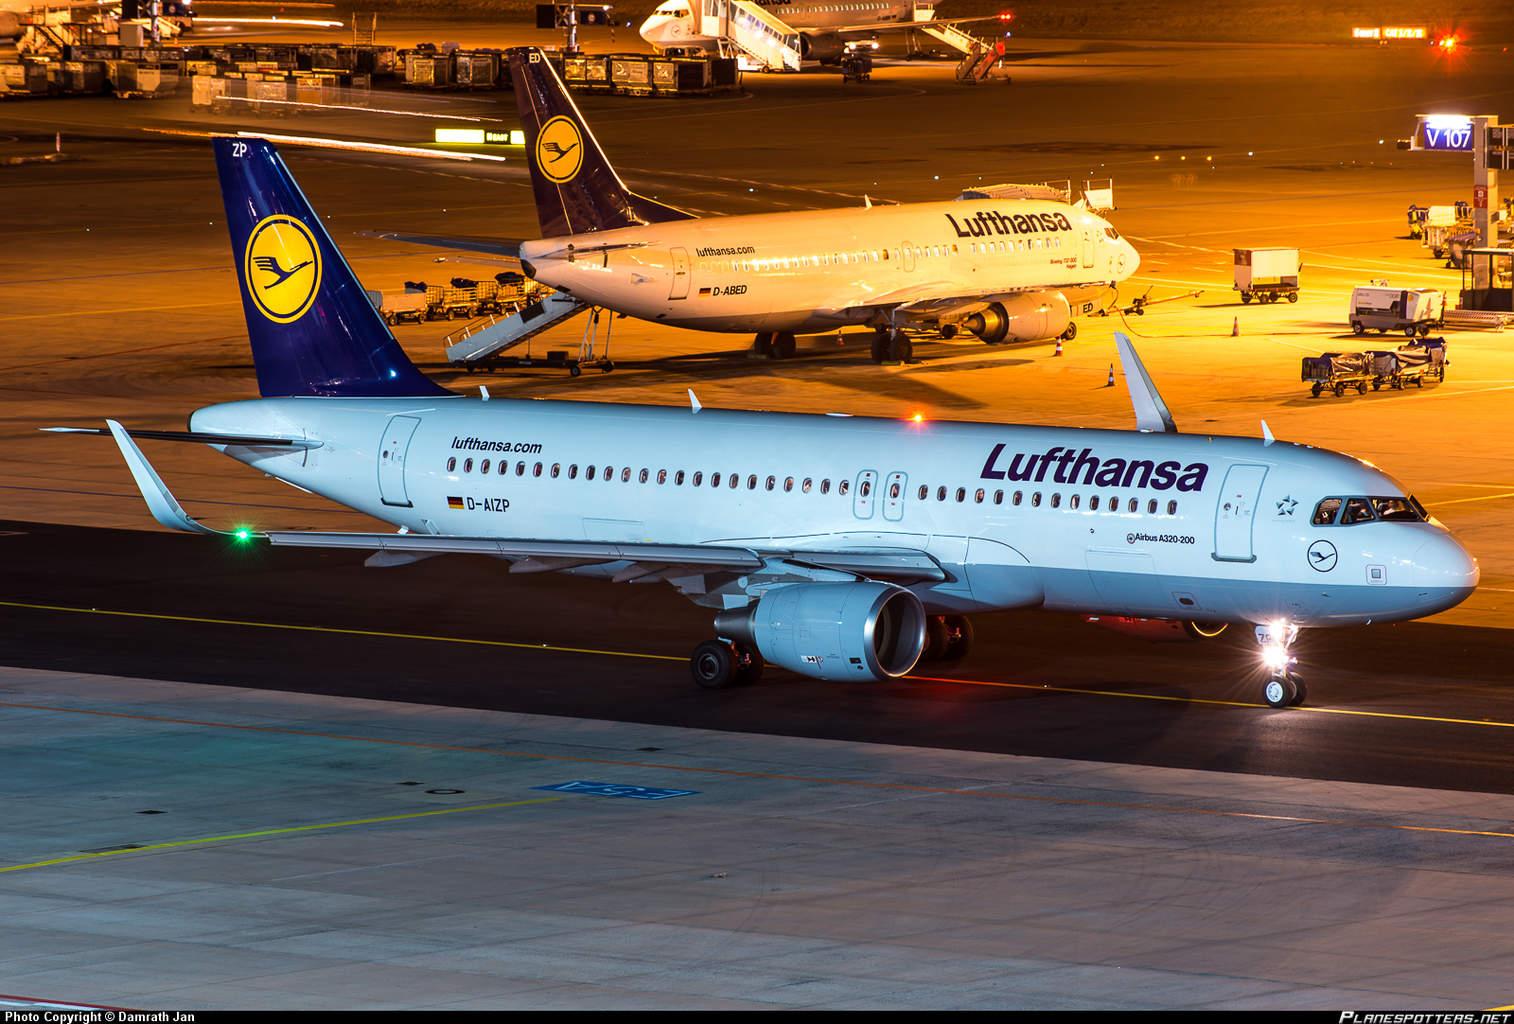 Passenger on Lufthansa flight tries to open door in-flight